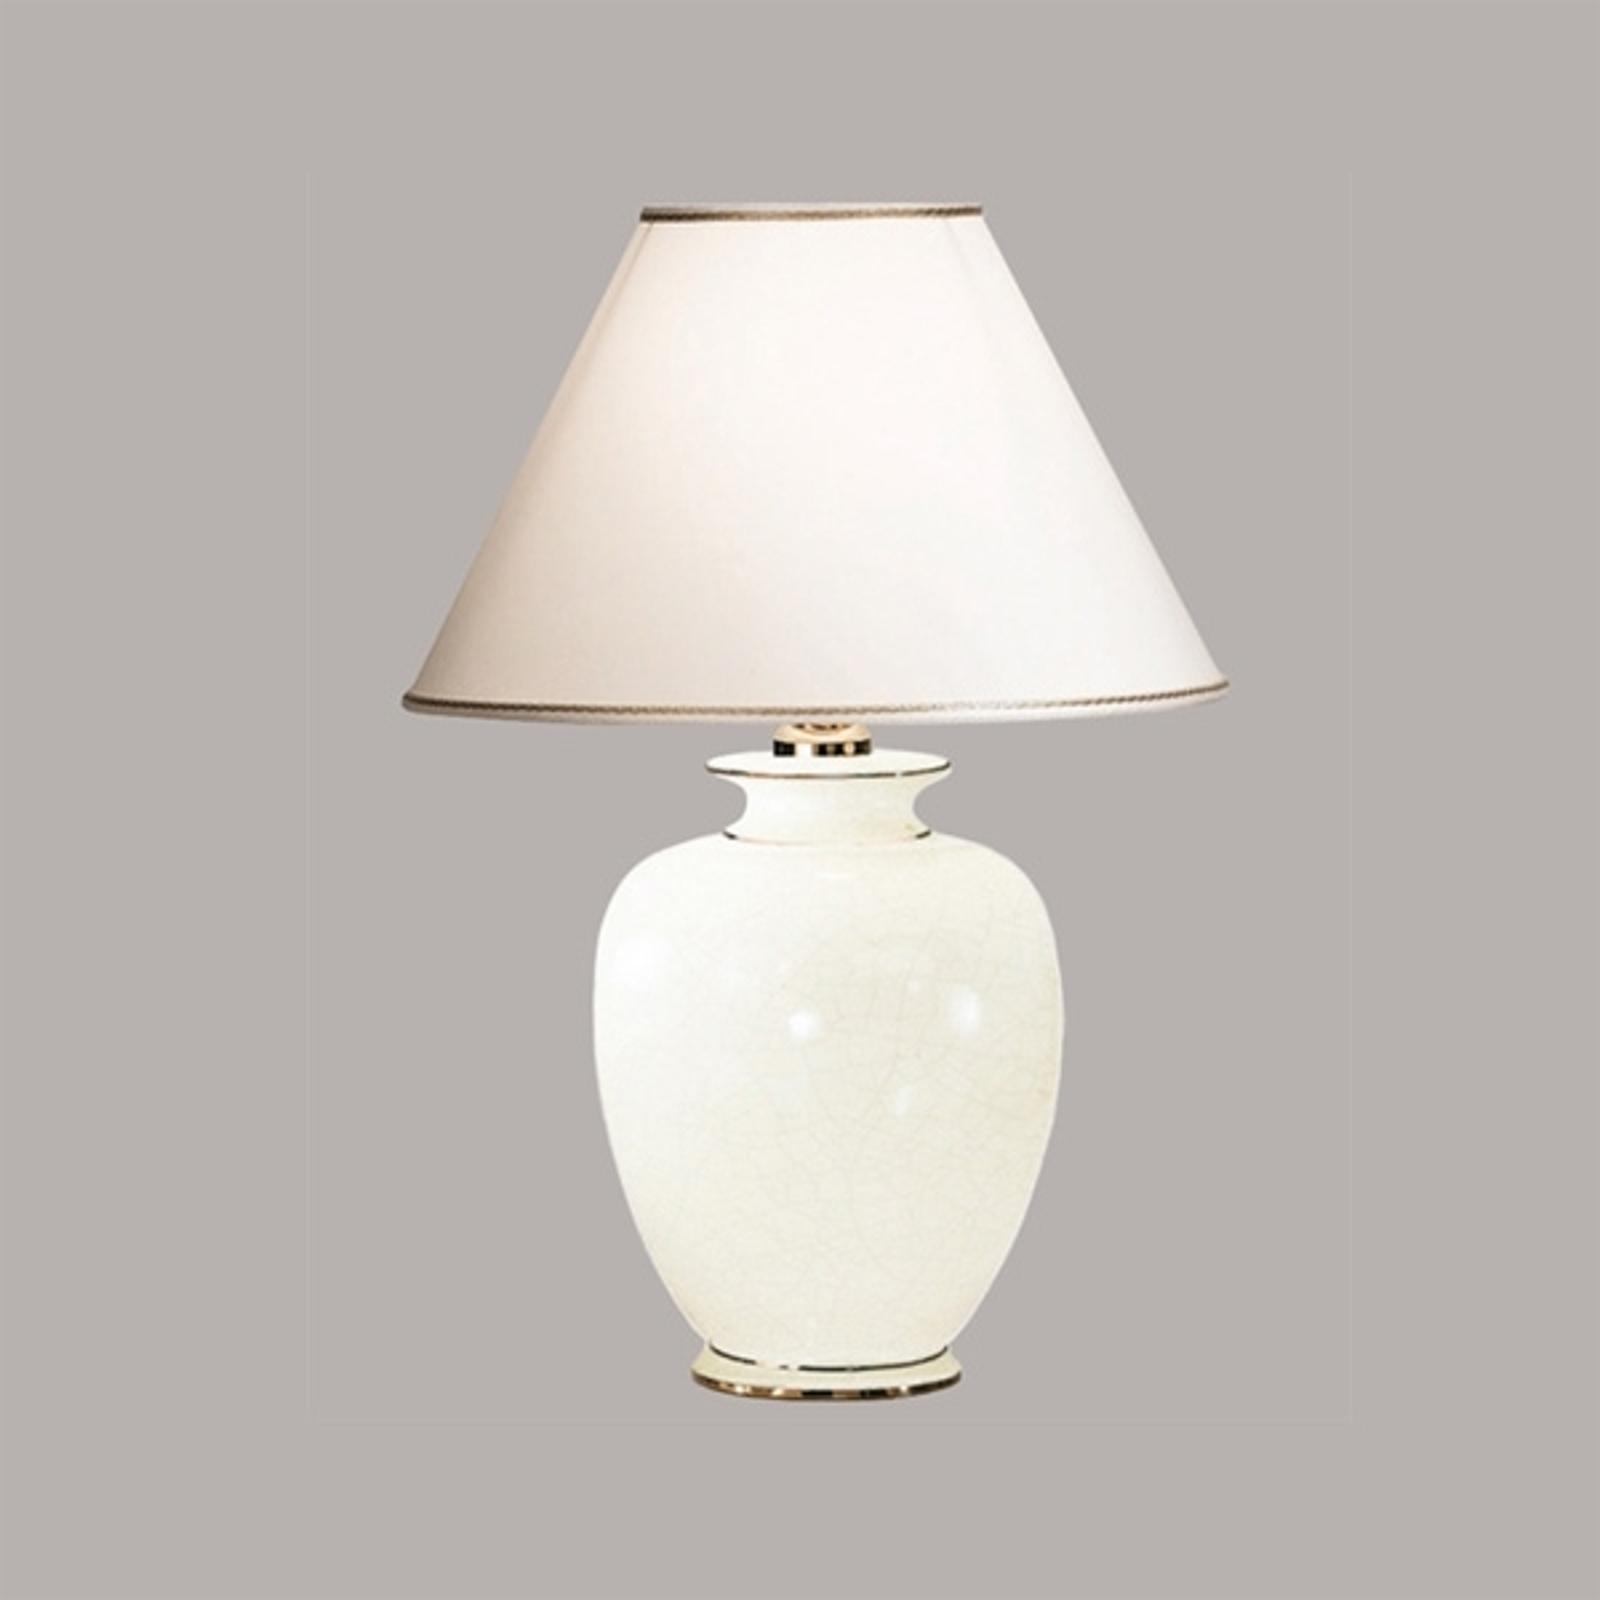 Witte tafellamp GIARDINO CRACLEE, 40 cm